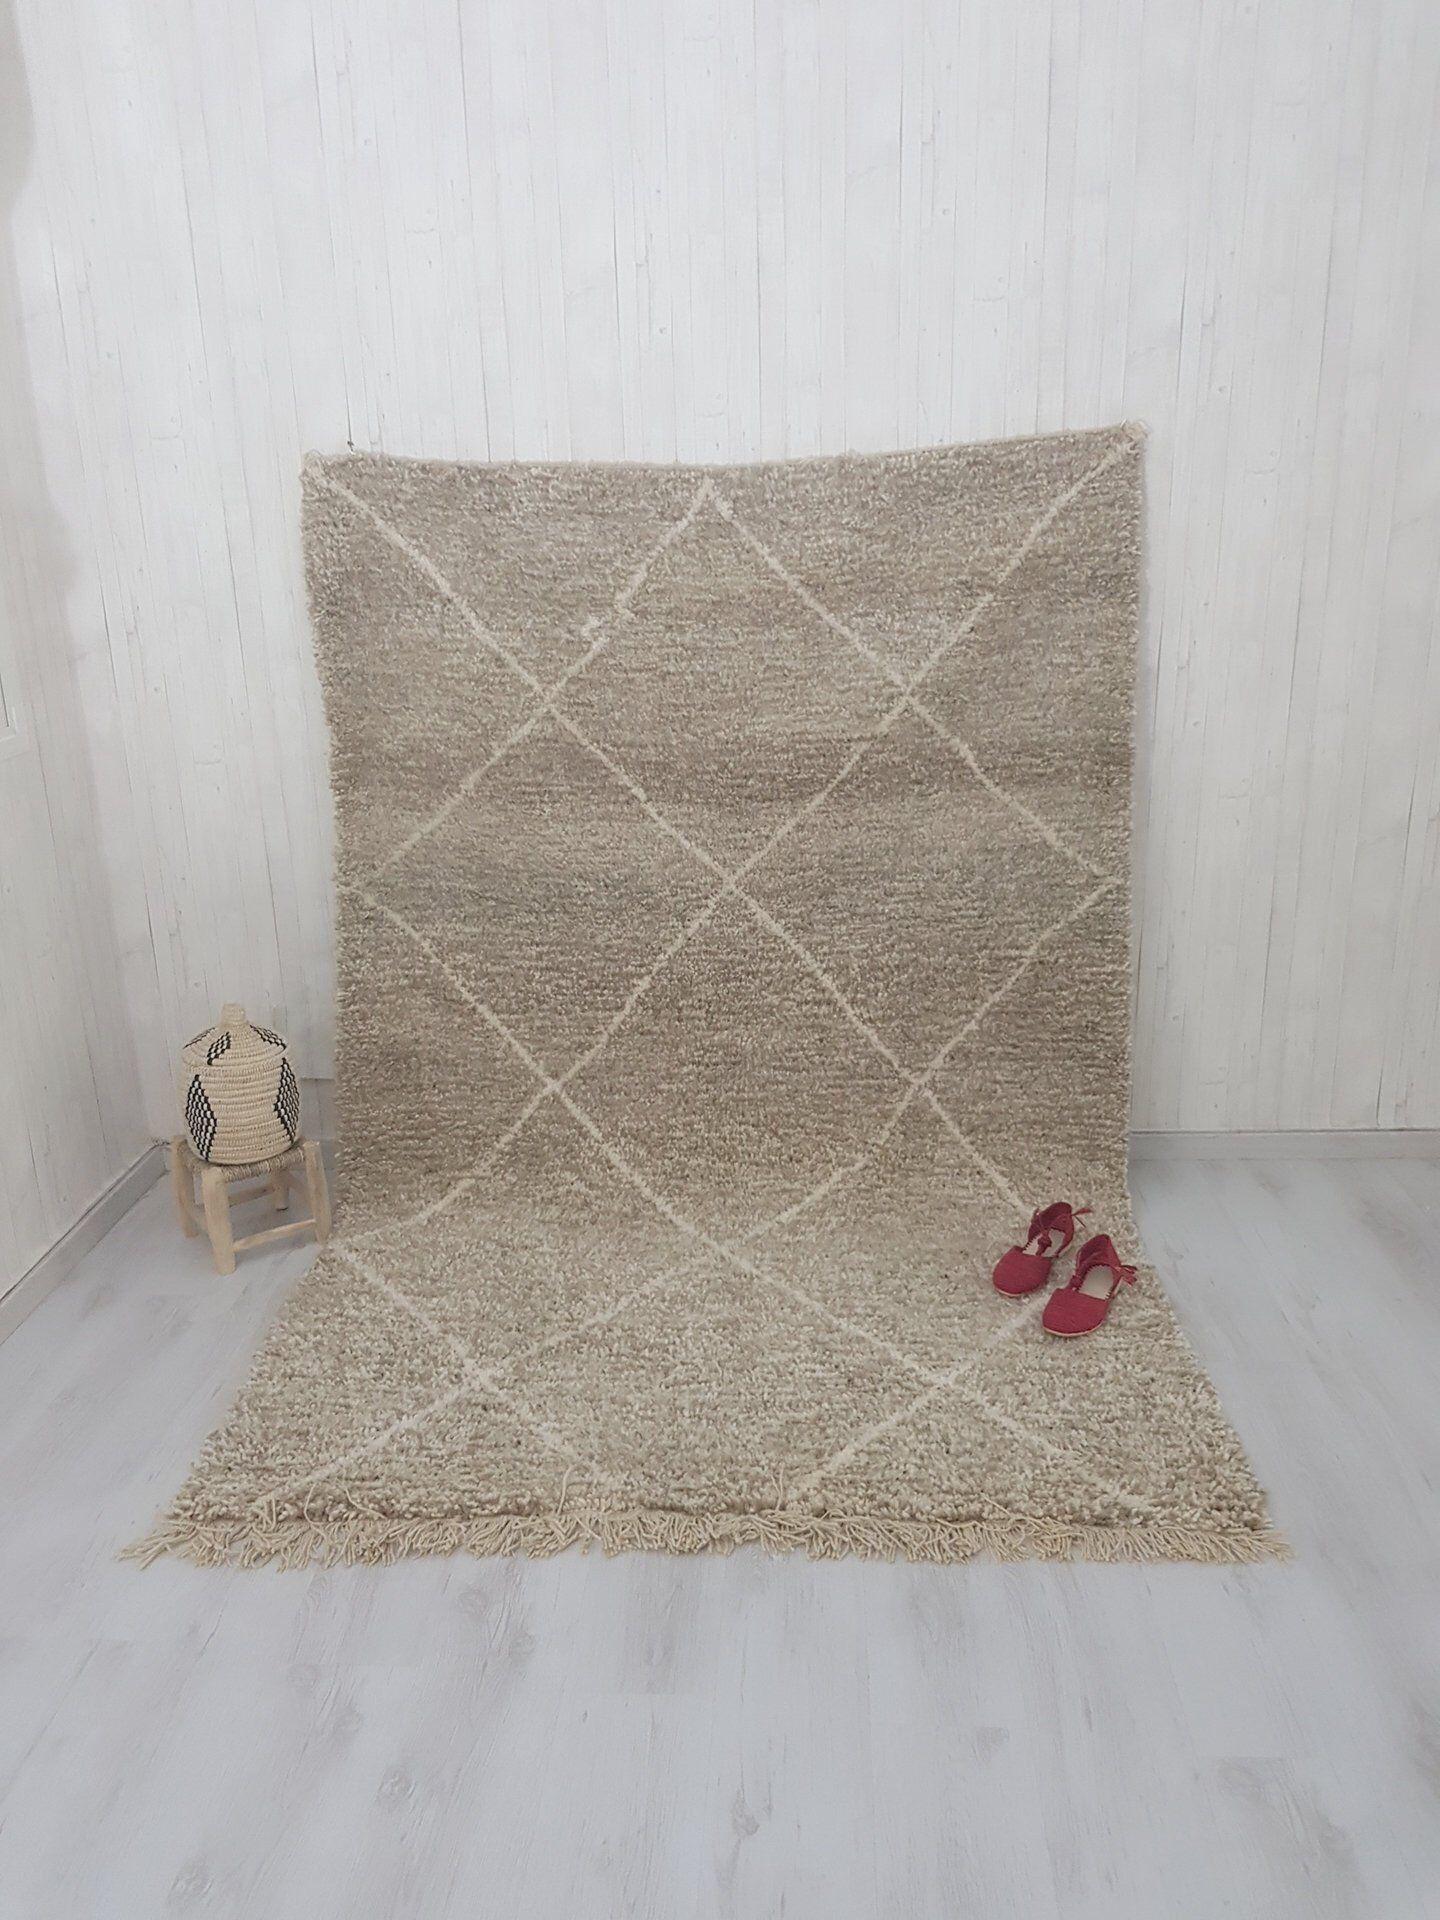 Beni Ouarain 5 3x7 9 Ft Rare Moroccan Beni Ourain Rug Authentic Rug Morrocan Rug Aspro Rug 30 Off Wool Berber Carpet Handmade Ivory Rug Berber Carpet Authentic Rugs Carpet Handmade